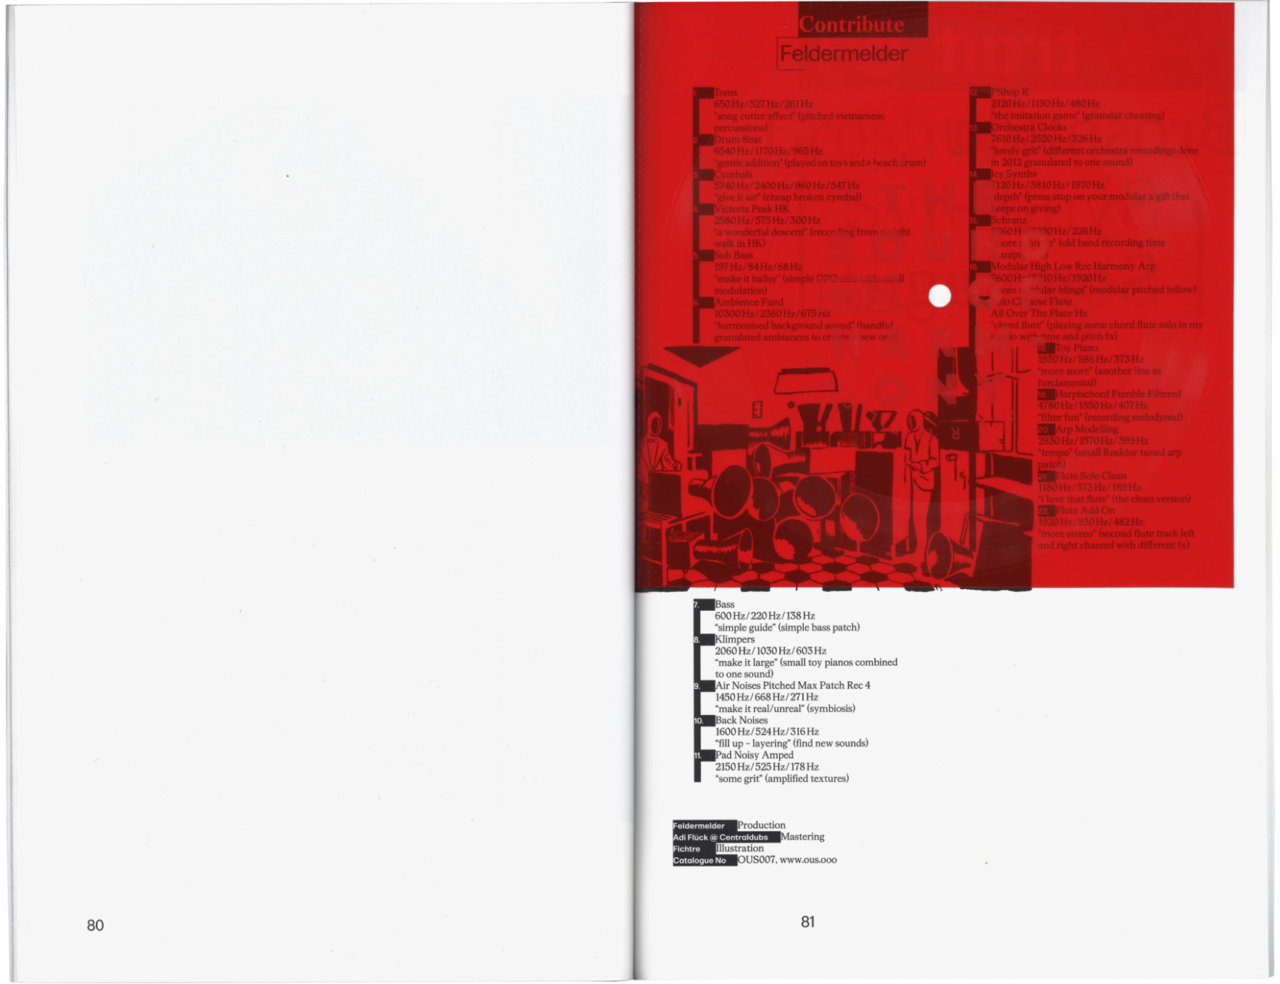 FICHTRE STUDIO - Mathias Forbach — OUS & ZWEIKOMMASIEBEN N°14: VINYL & ILLUSTRATION